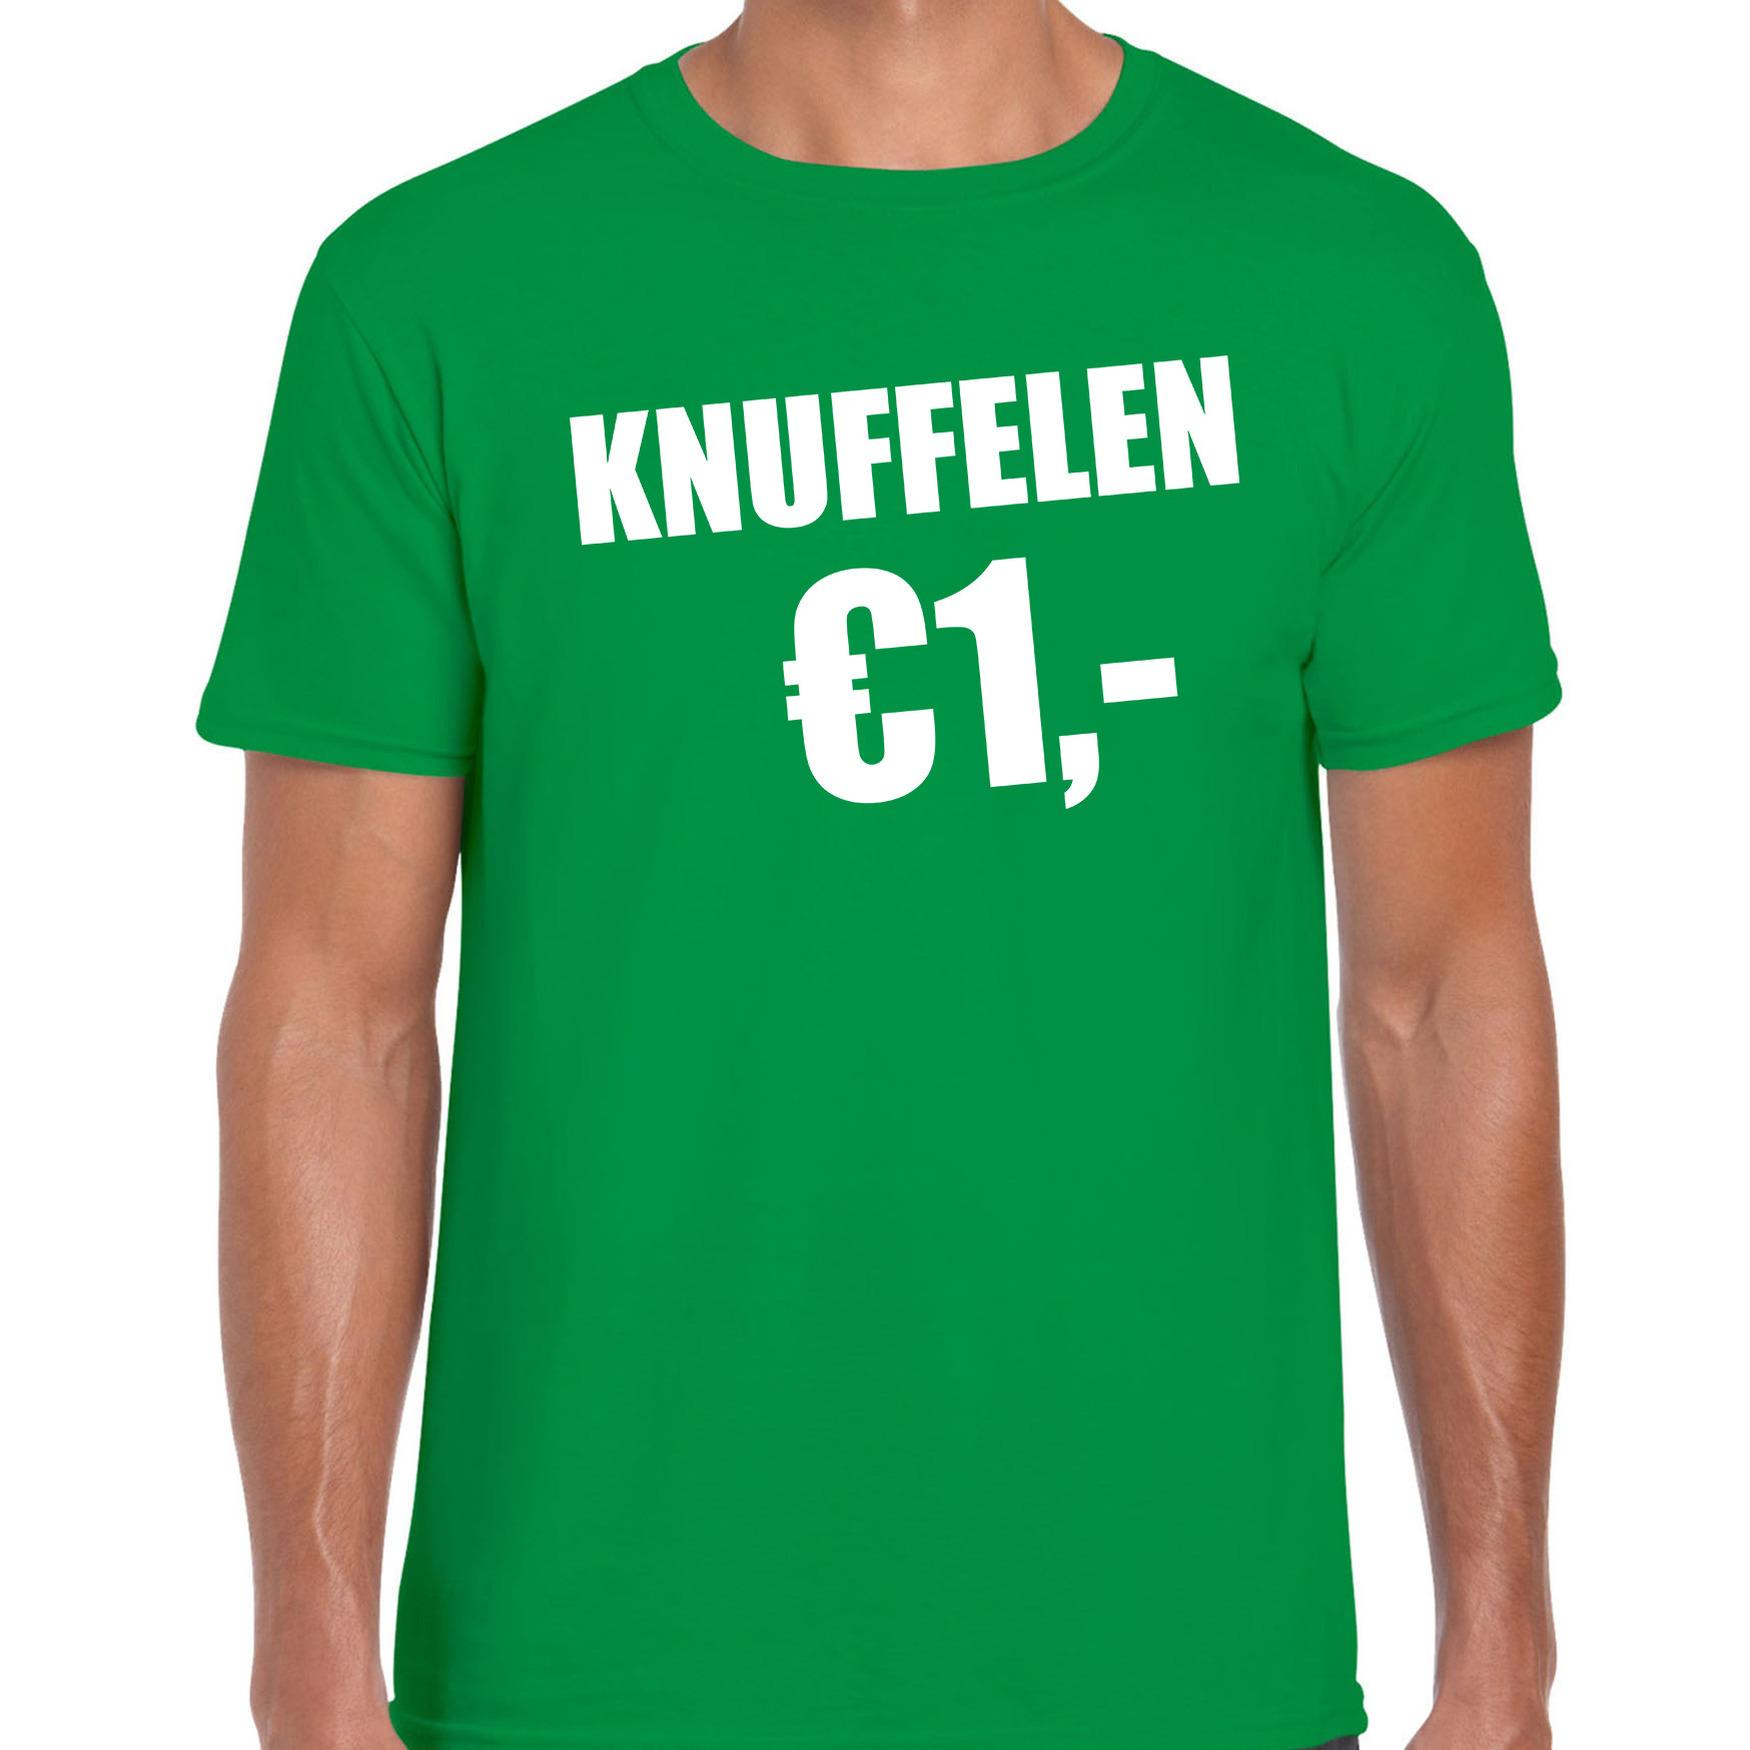 Fun t-shirt knuffelen 1 euro groen voor heren 2XL -